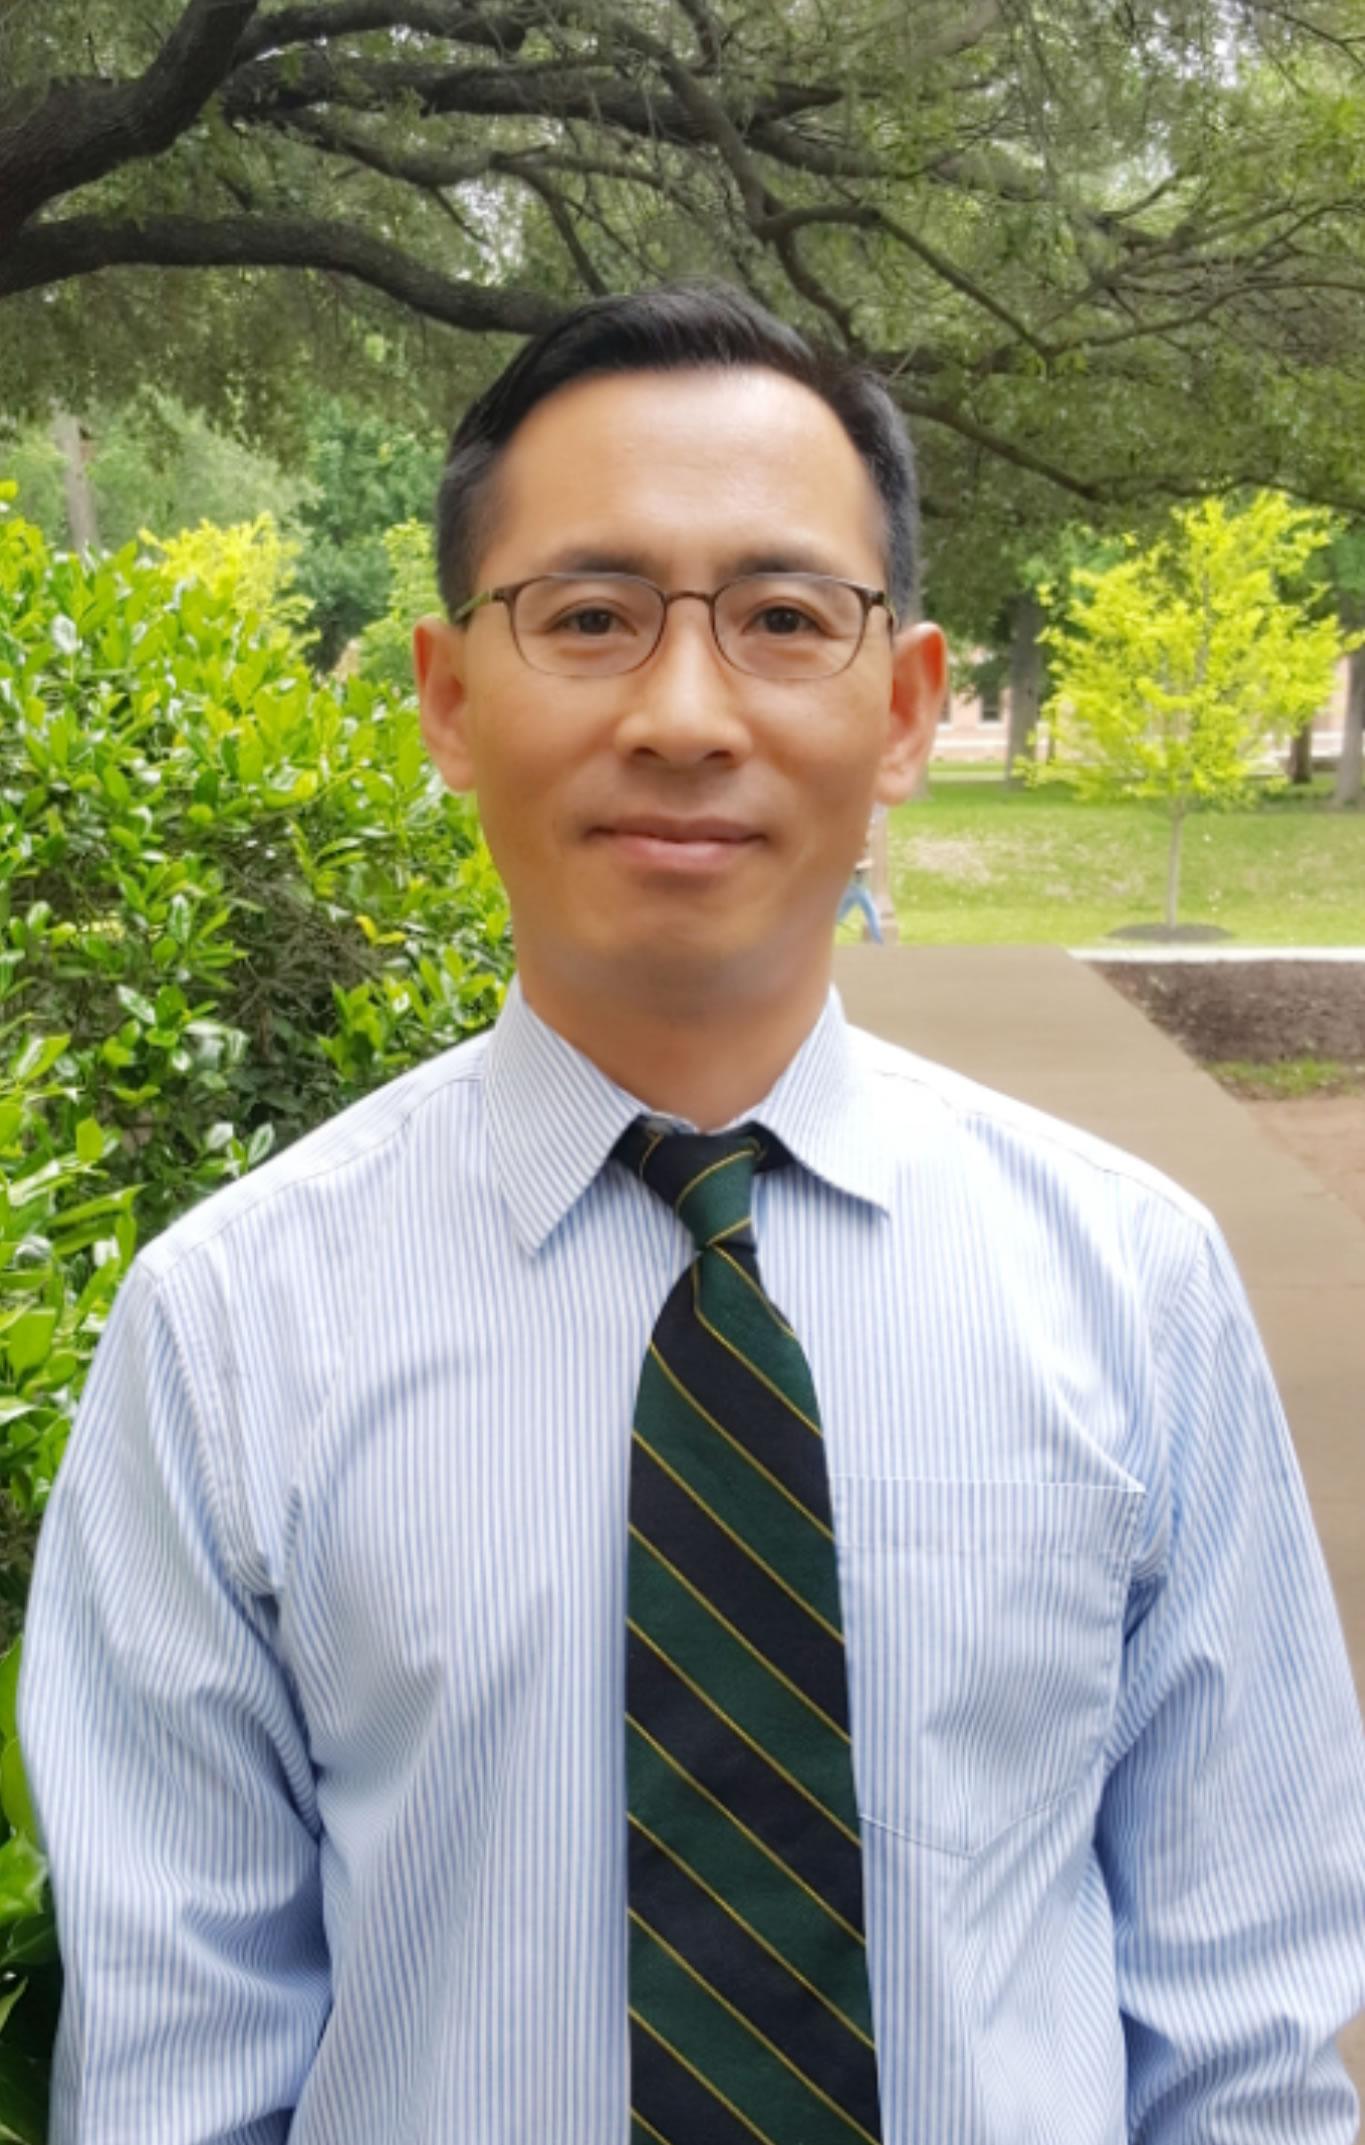 Jungjun Park, Ph.D. CCC-SLP